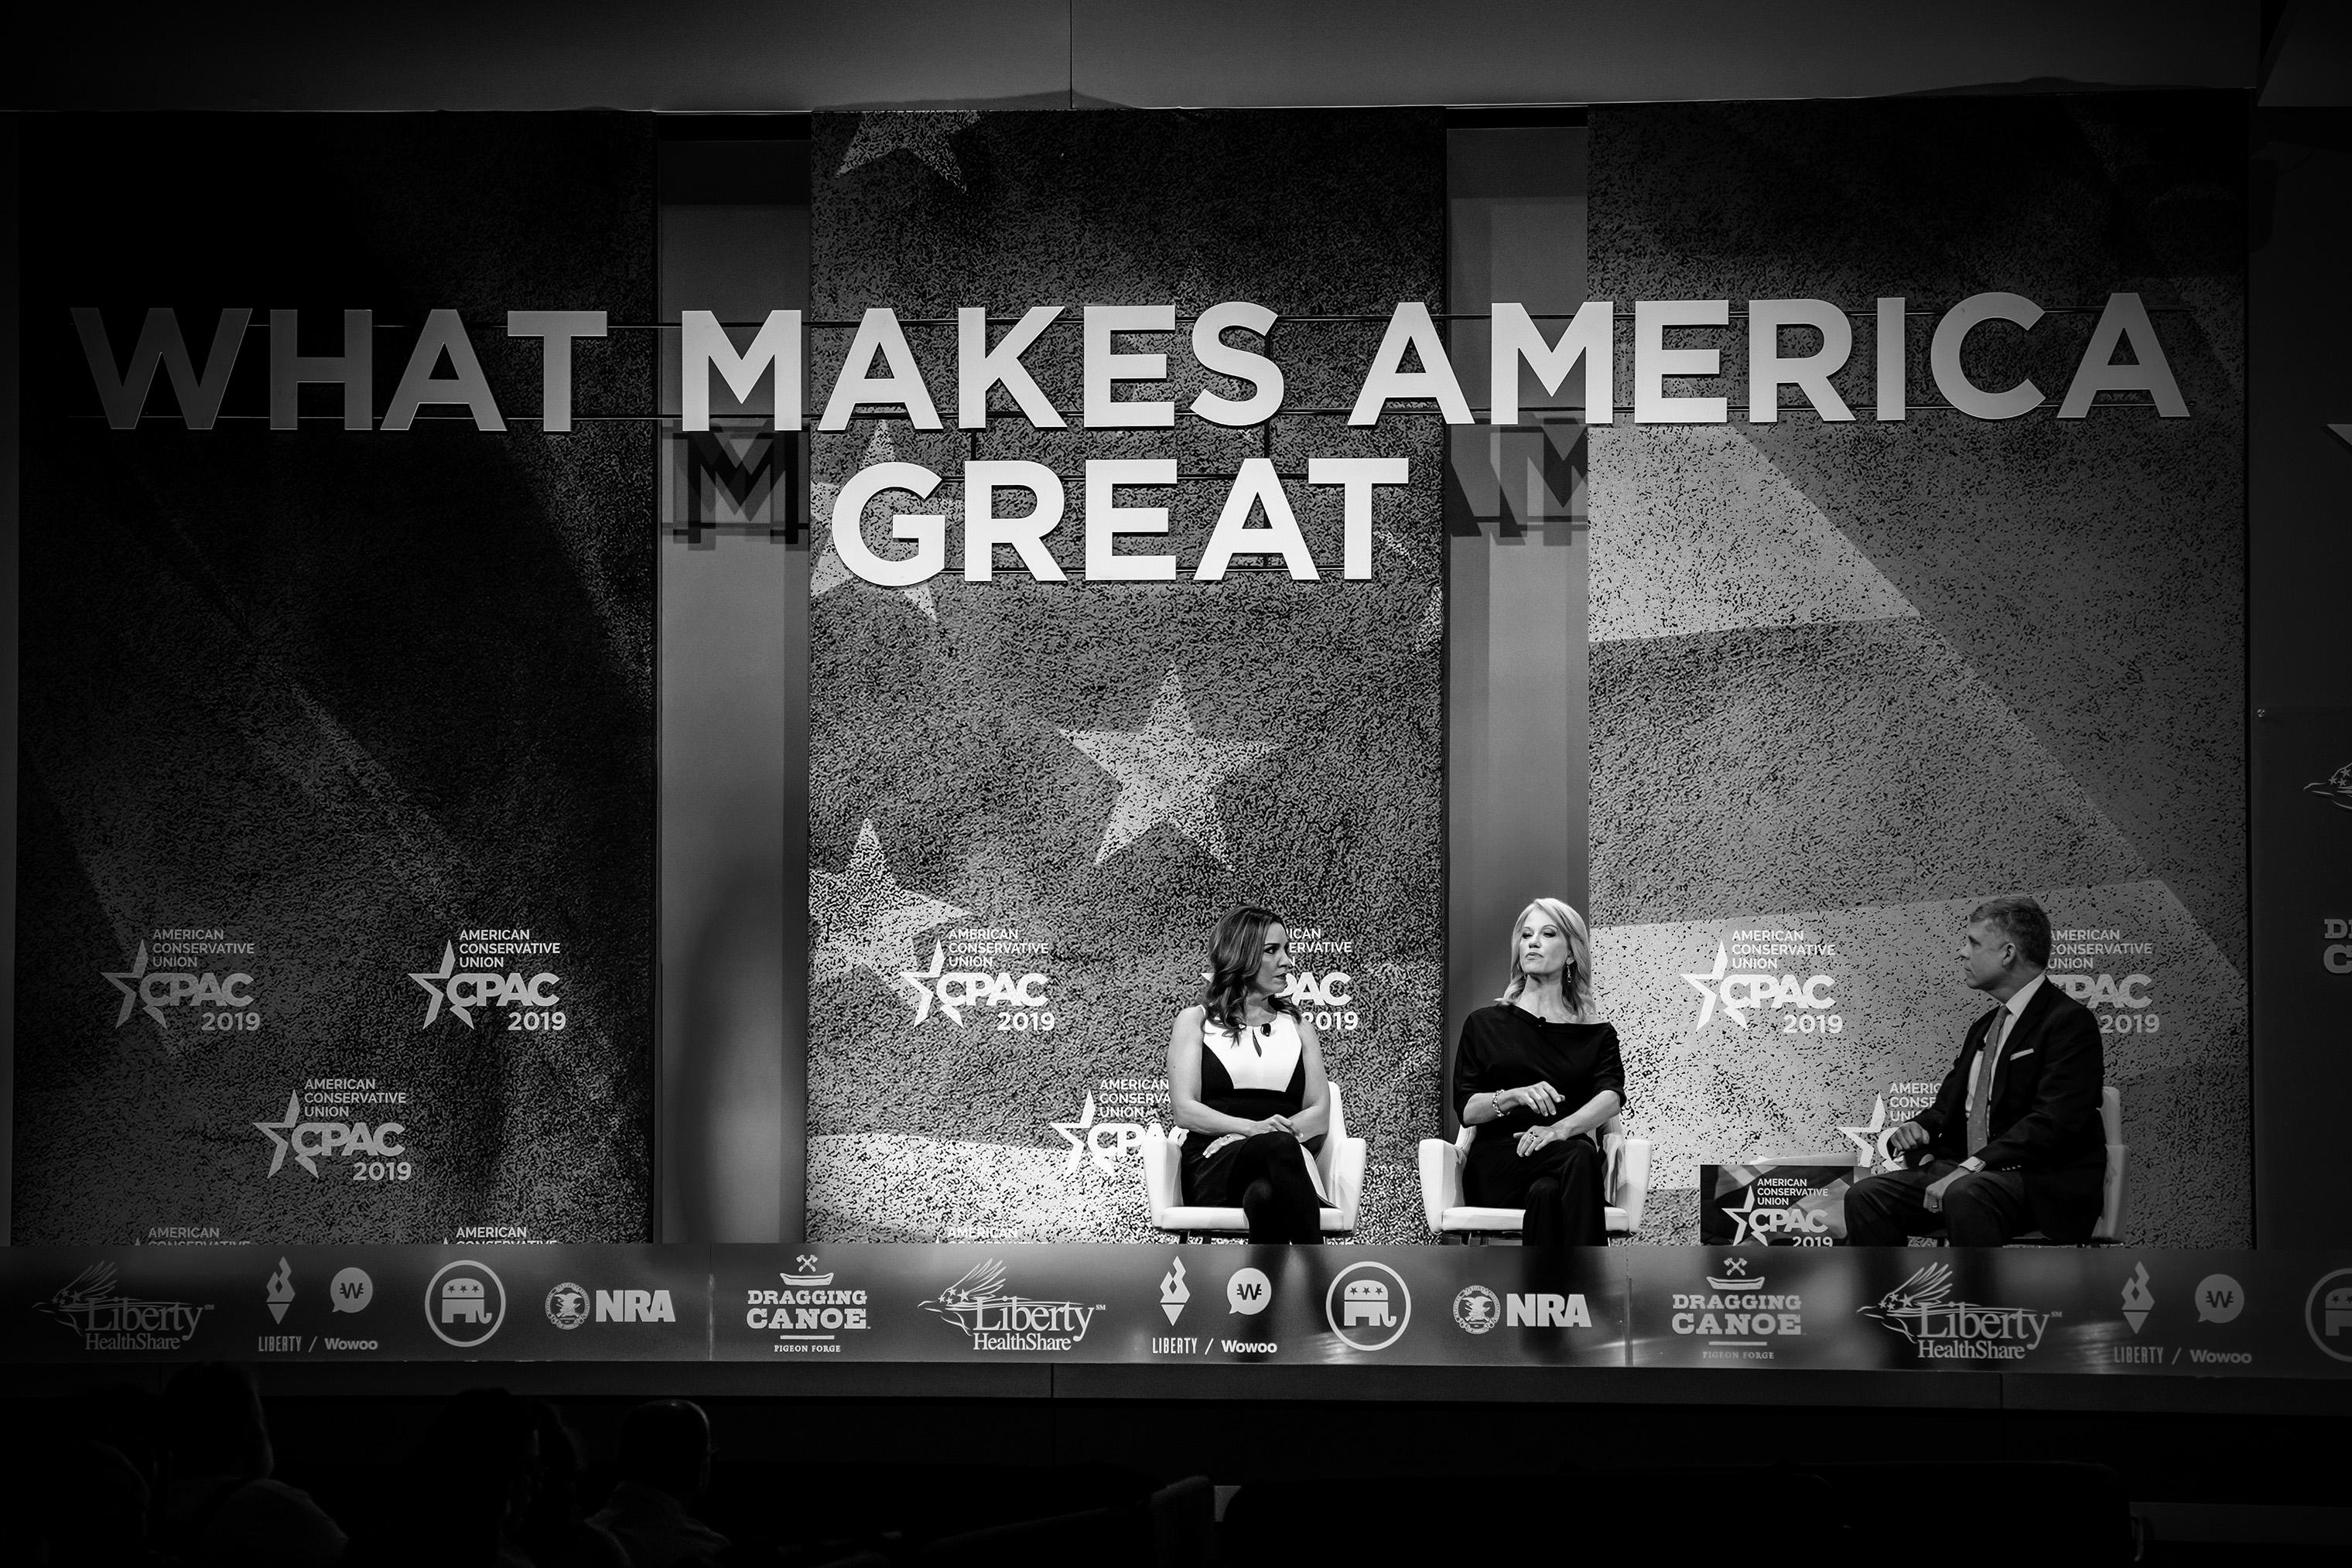 Fox News' Sara Carter and Kellyanne Conway are interviewed by Scott Walter.